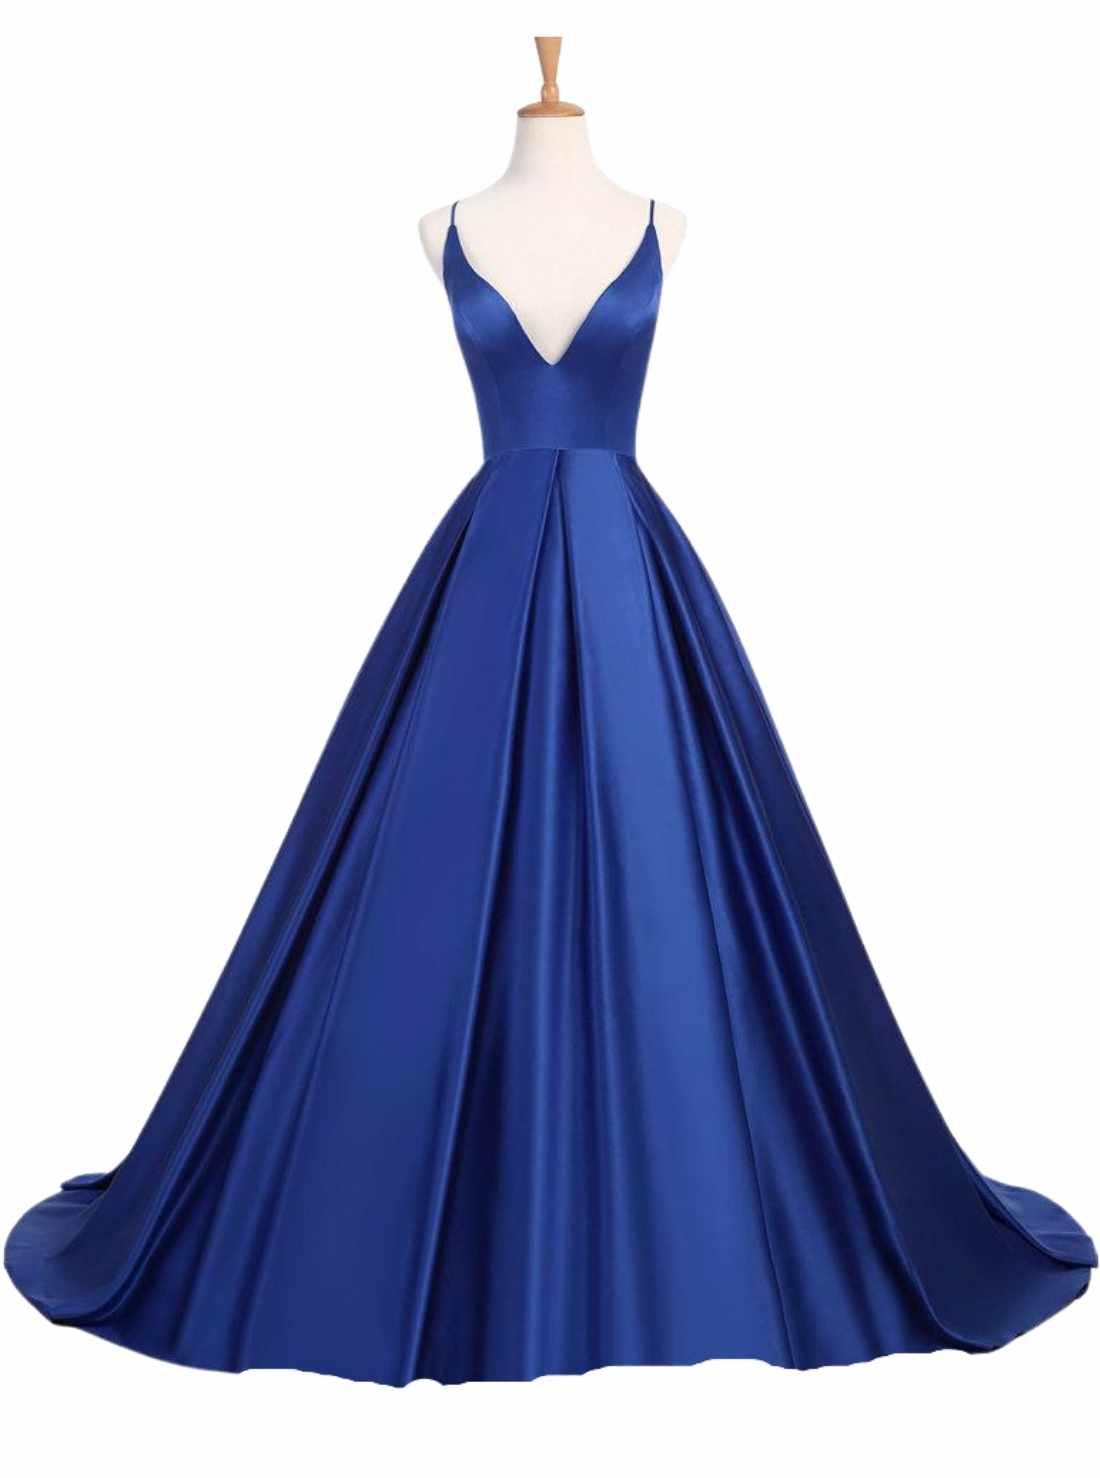 2021 Simple Royal Blue Prom Dresses Satin Spaghetti Burgundy Evening Gowns Cross Back